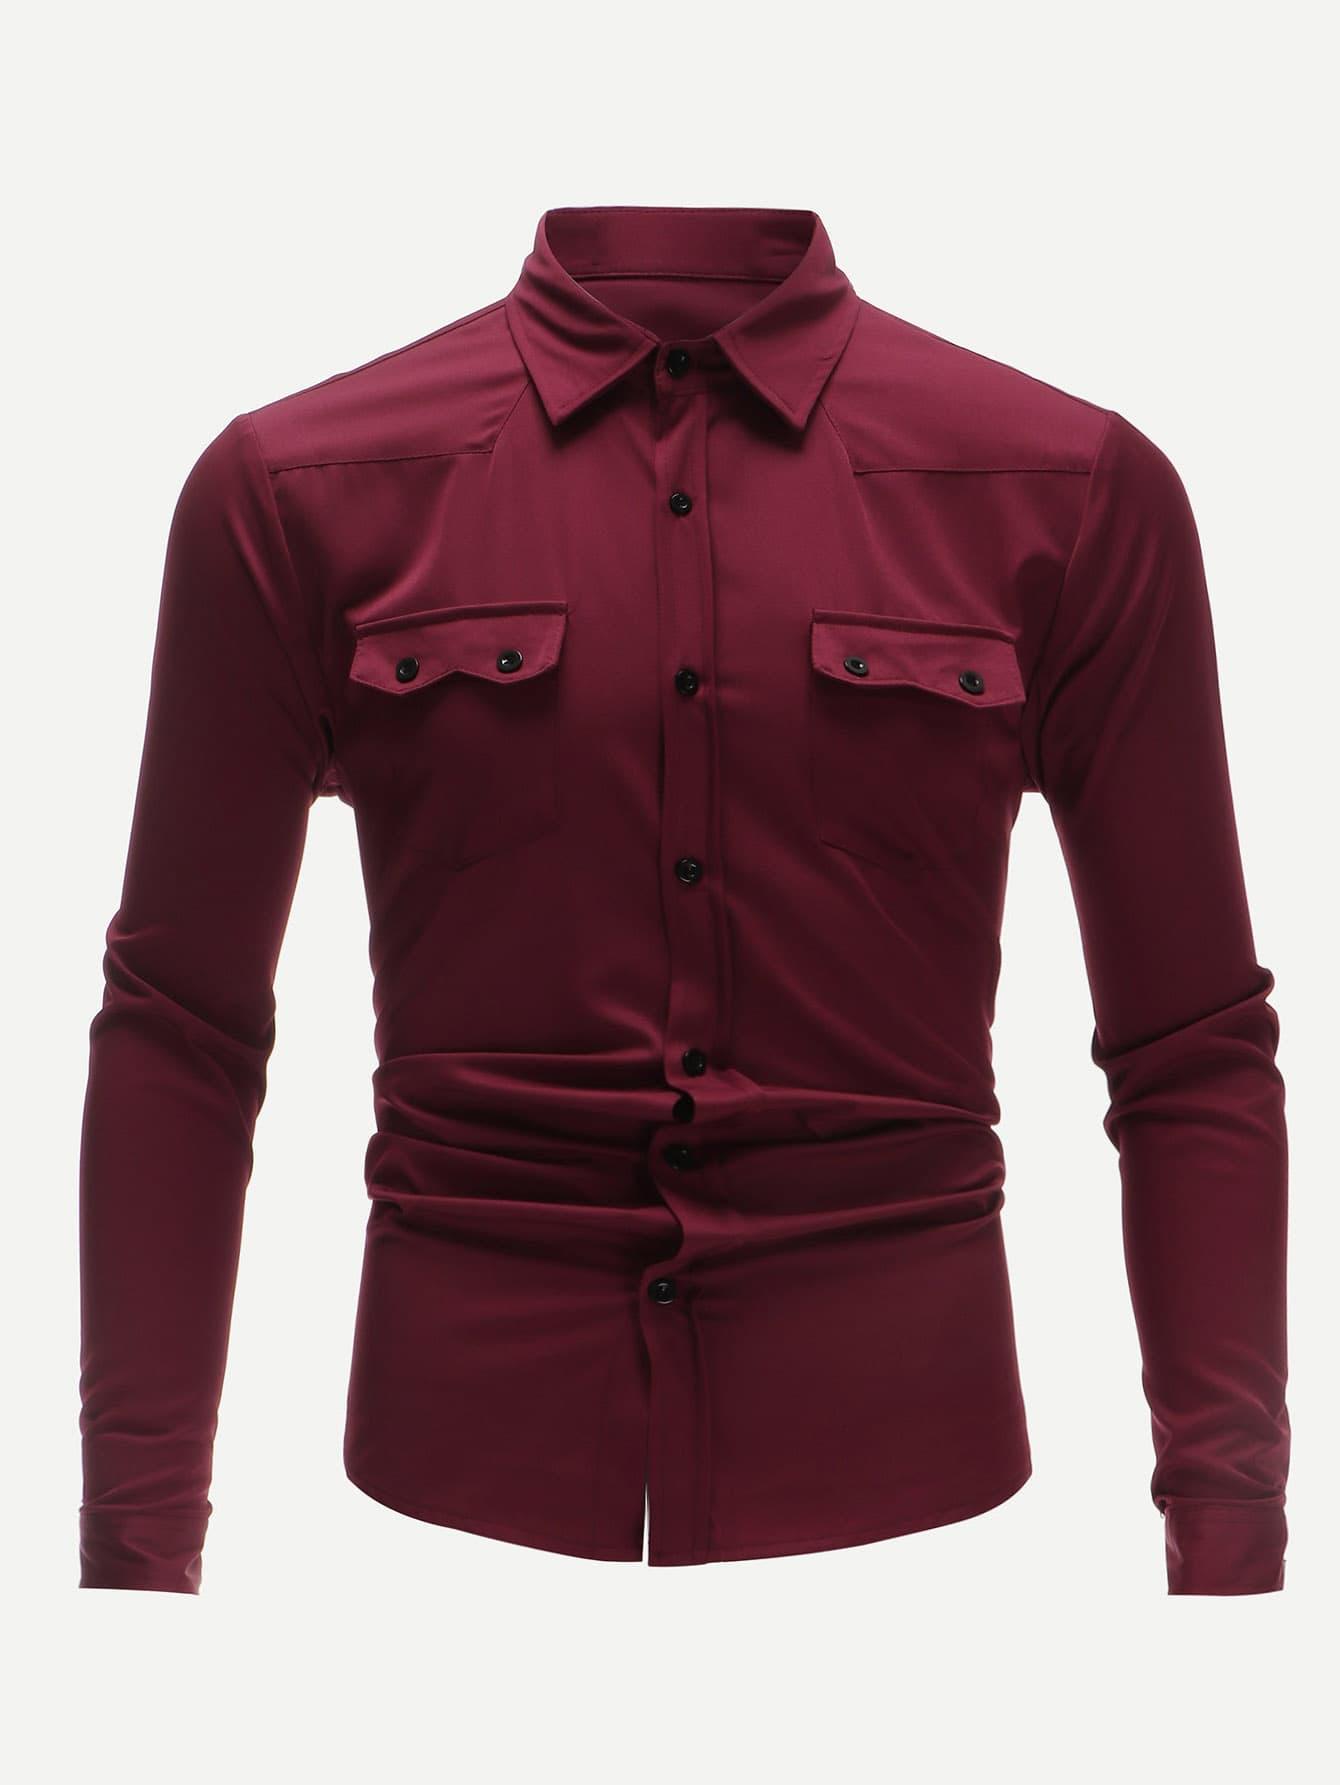 Купить Мужская однотонная футболка с двумя кармана, null, SheIn